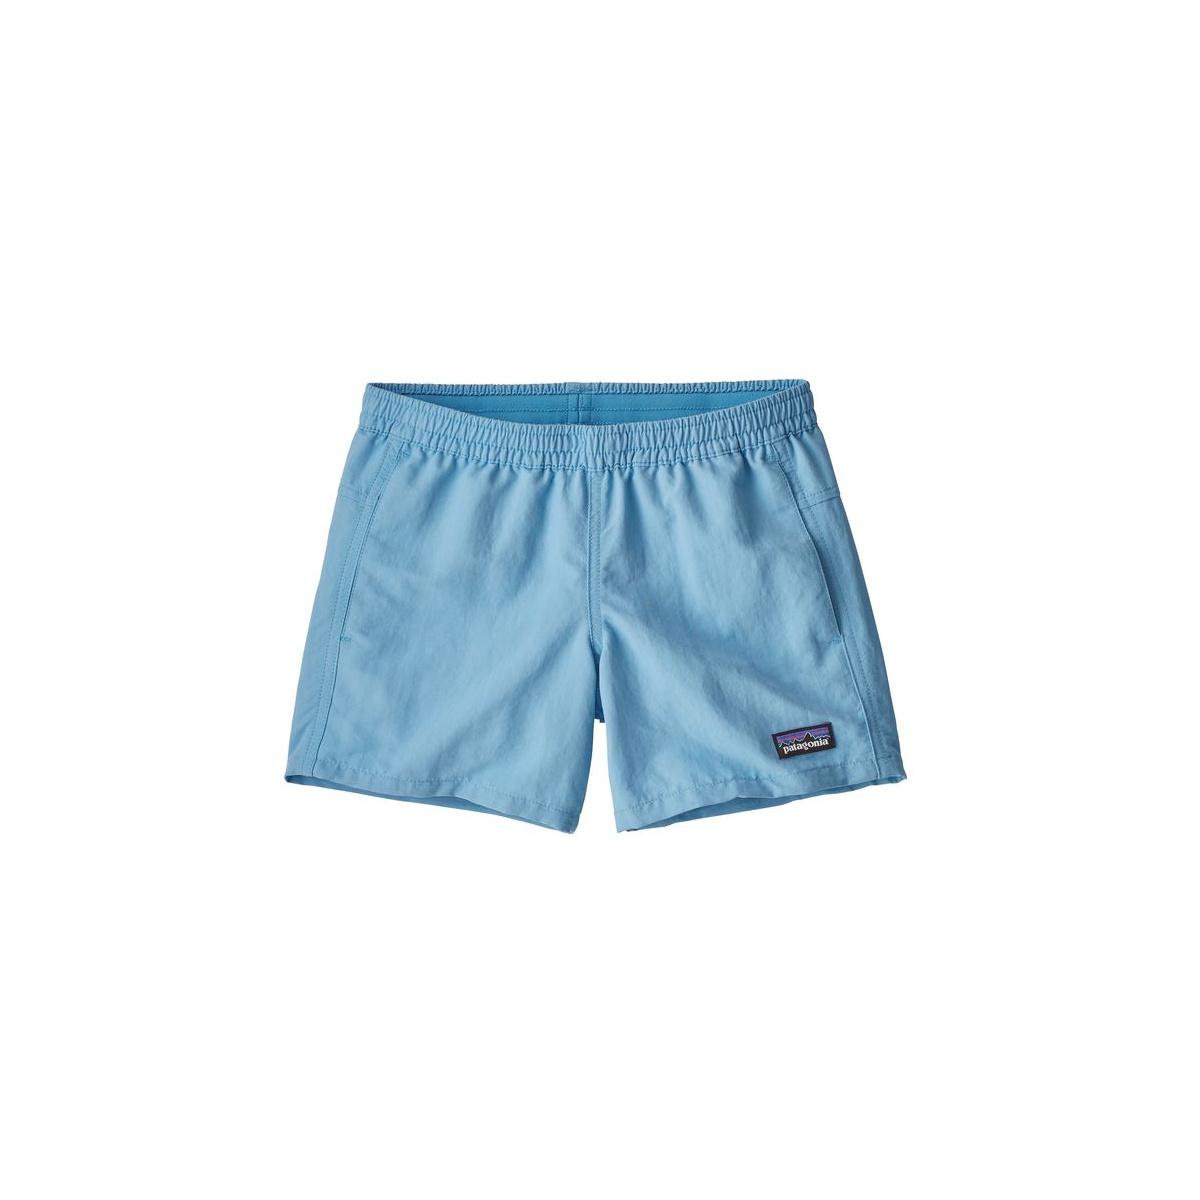 Patagonia Girl's Baggies Shorts